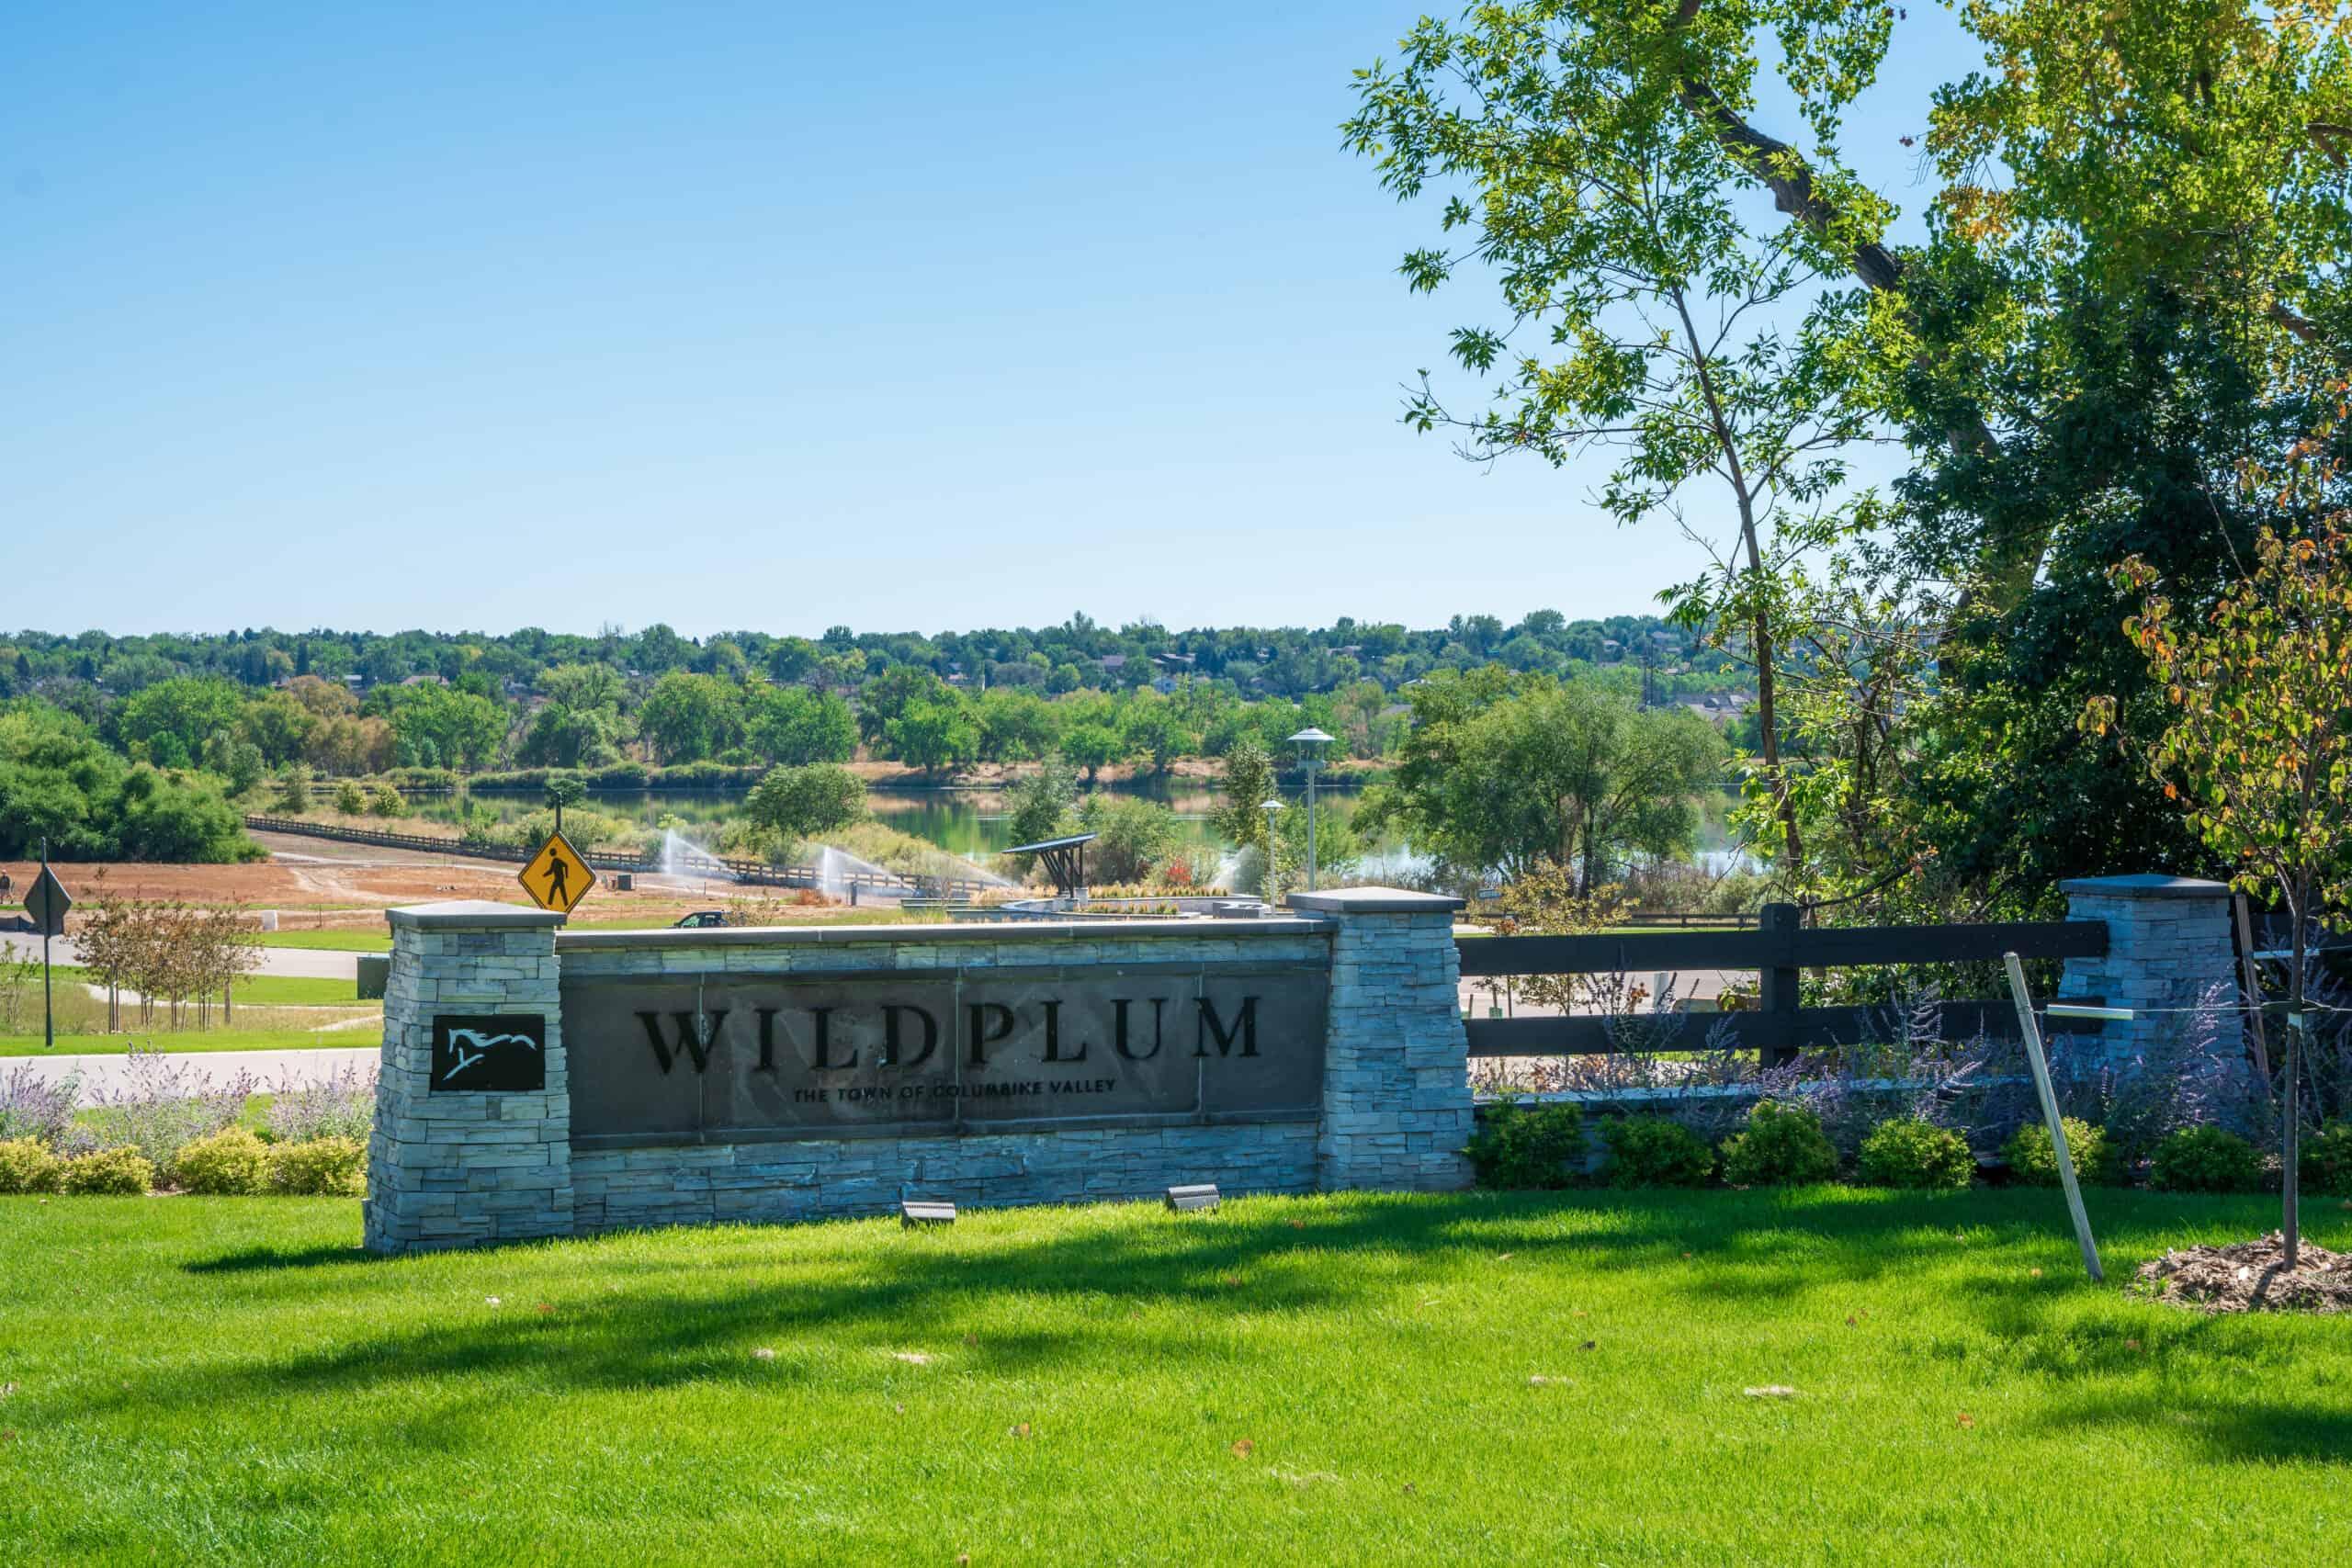 Wild Plum by Lennar Homes